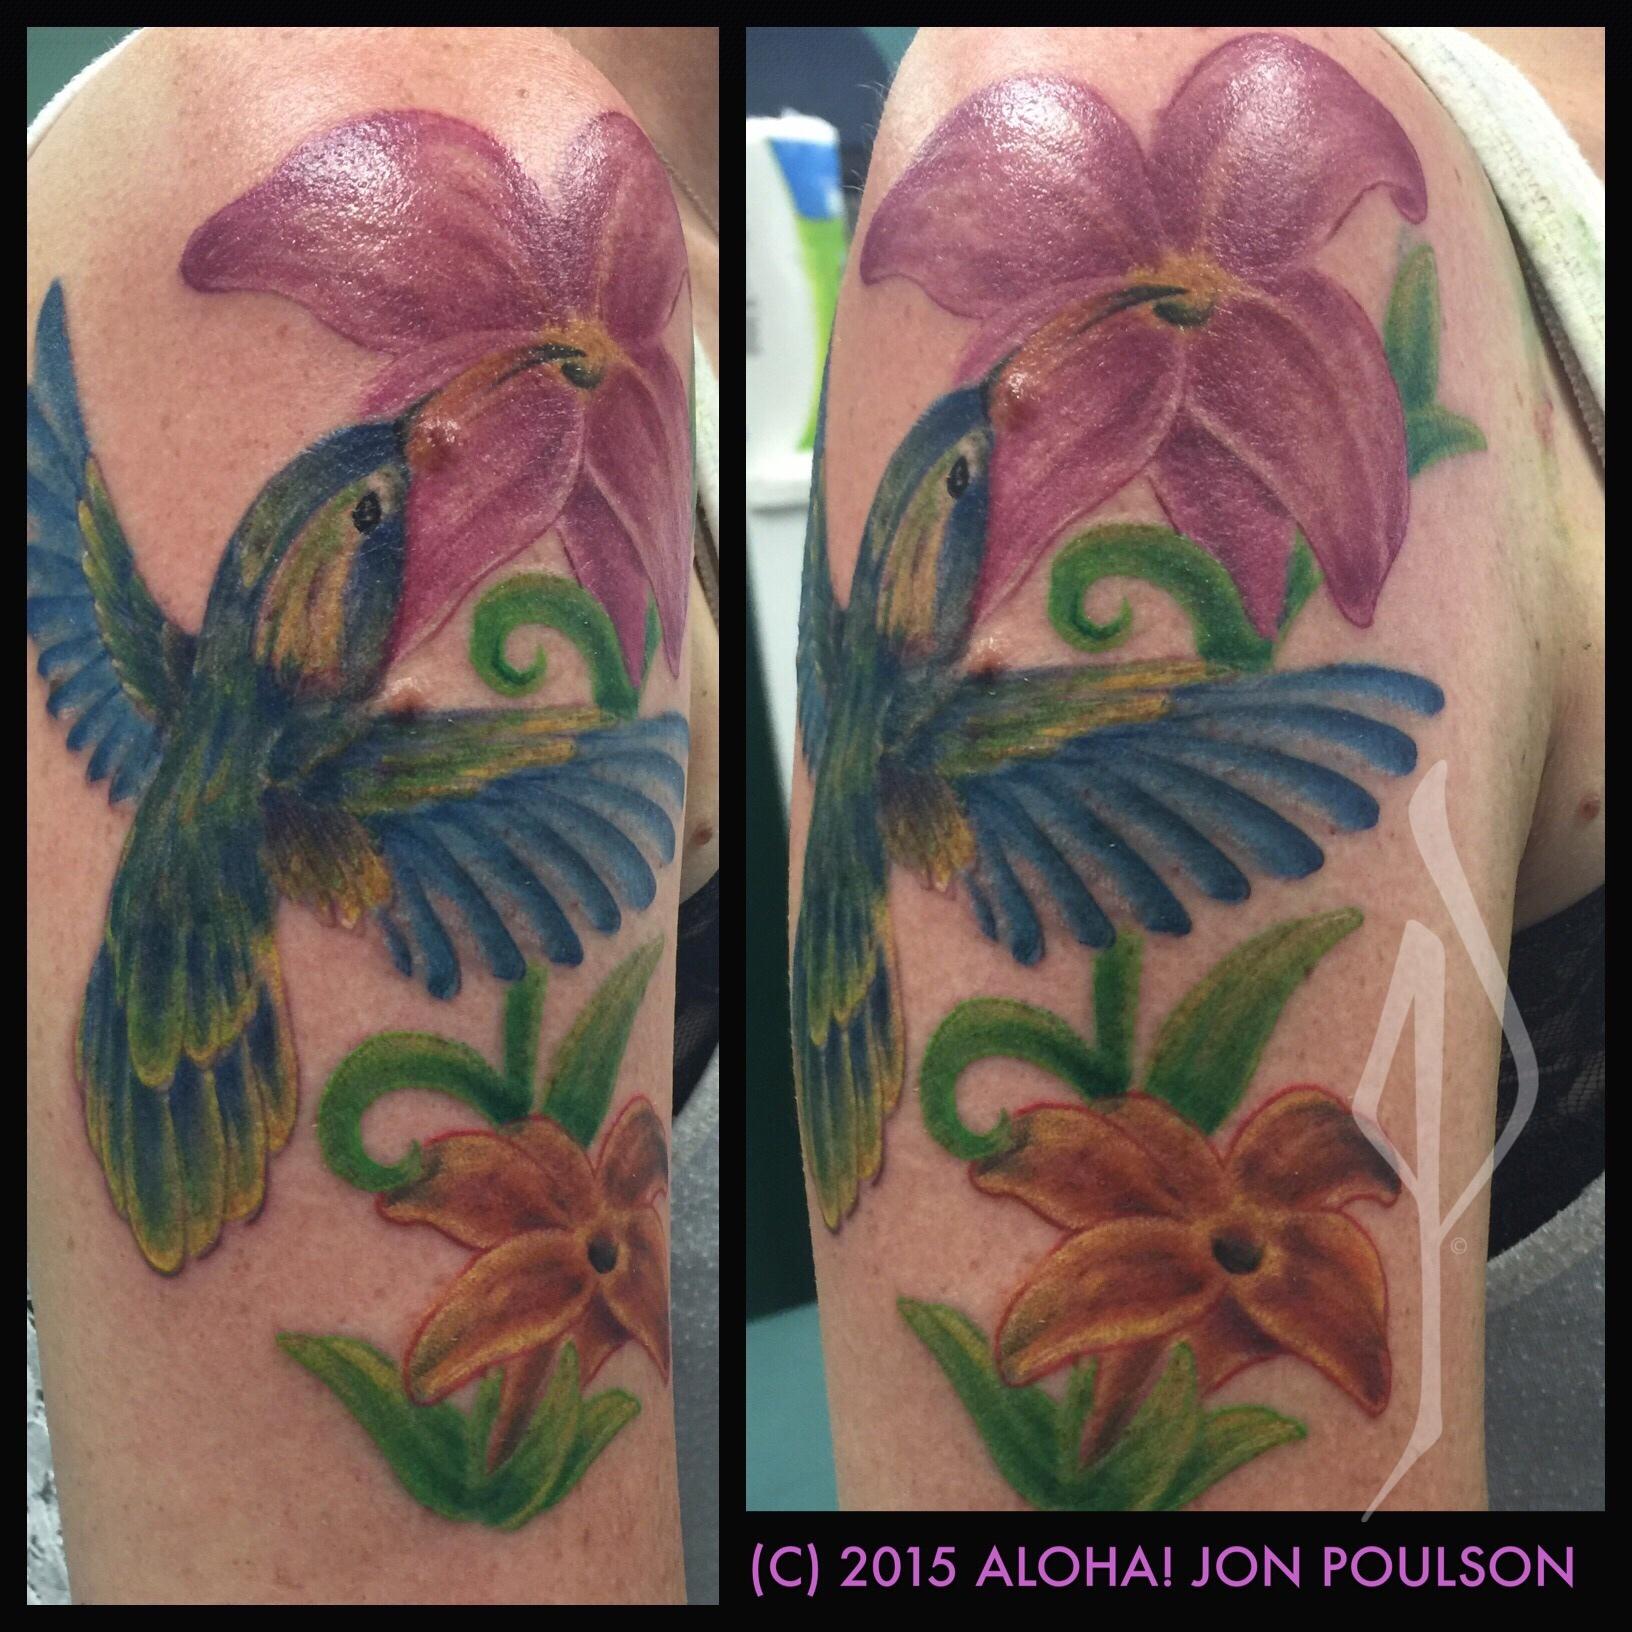 Freehand Watercolor Bird with Flowers Tattoo by Jon Poulson - Aloha Salt Lake Tattoos